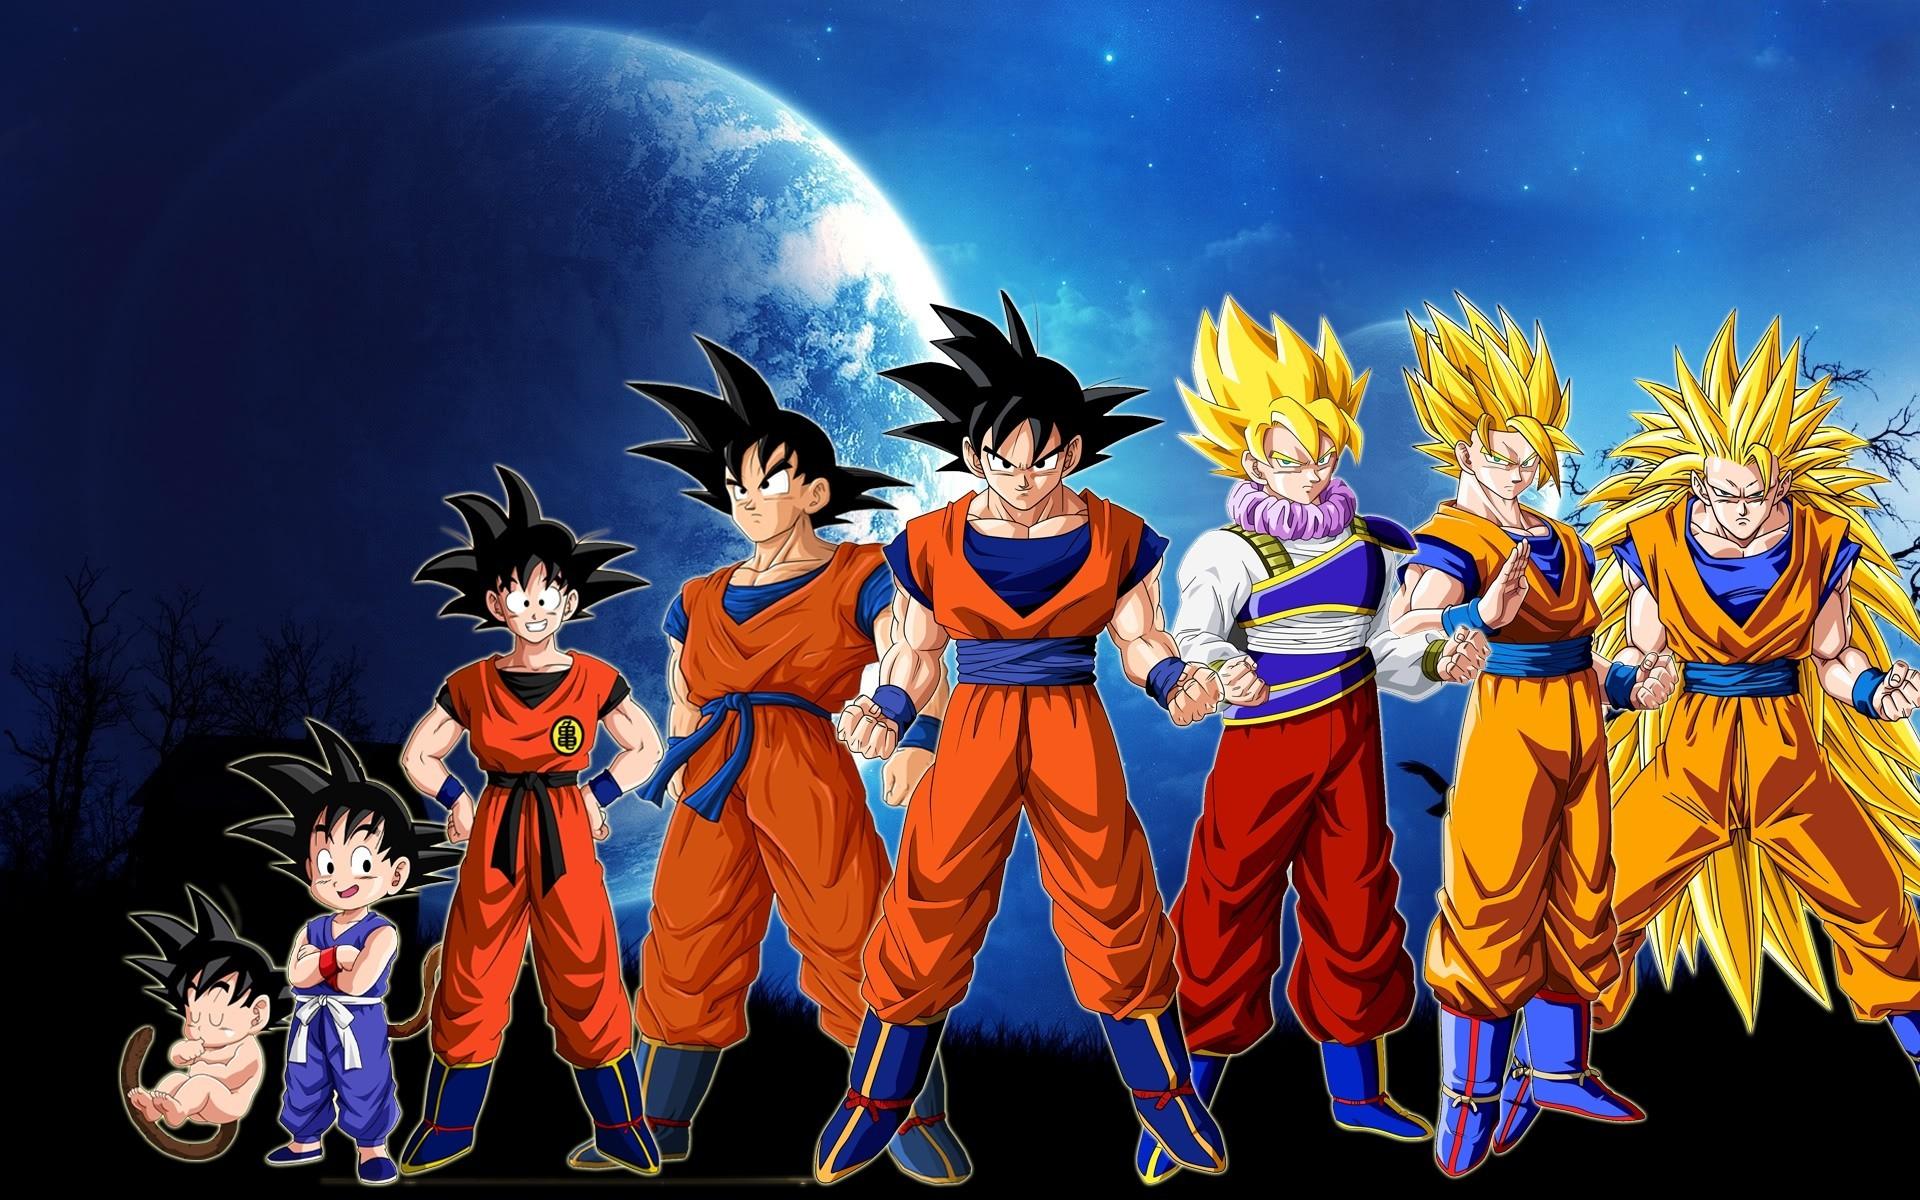 Dragon Ball Z Para Colorear Goku Super Saiyan 5: Goku Super Saiyan Wallpaper (72+ Images